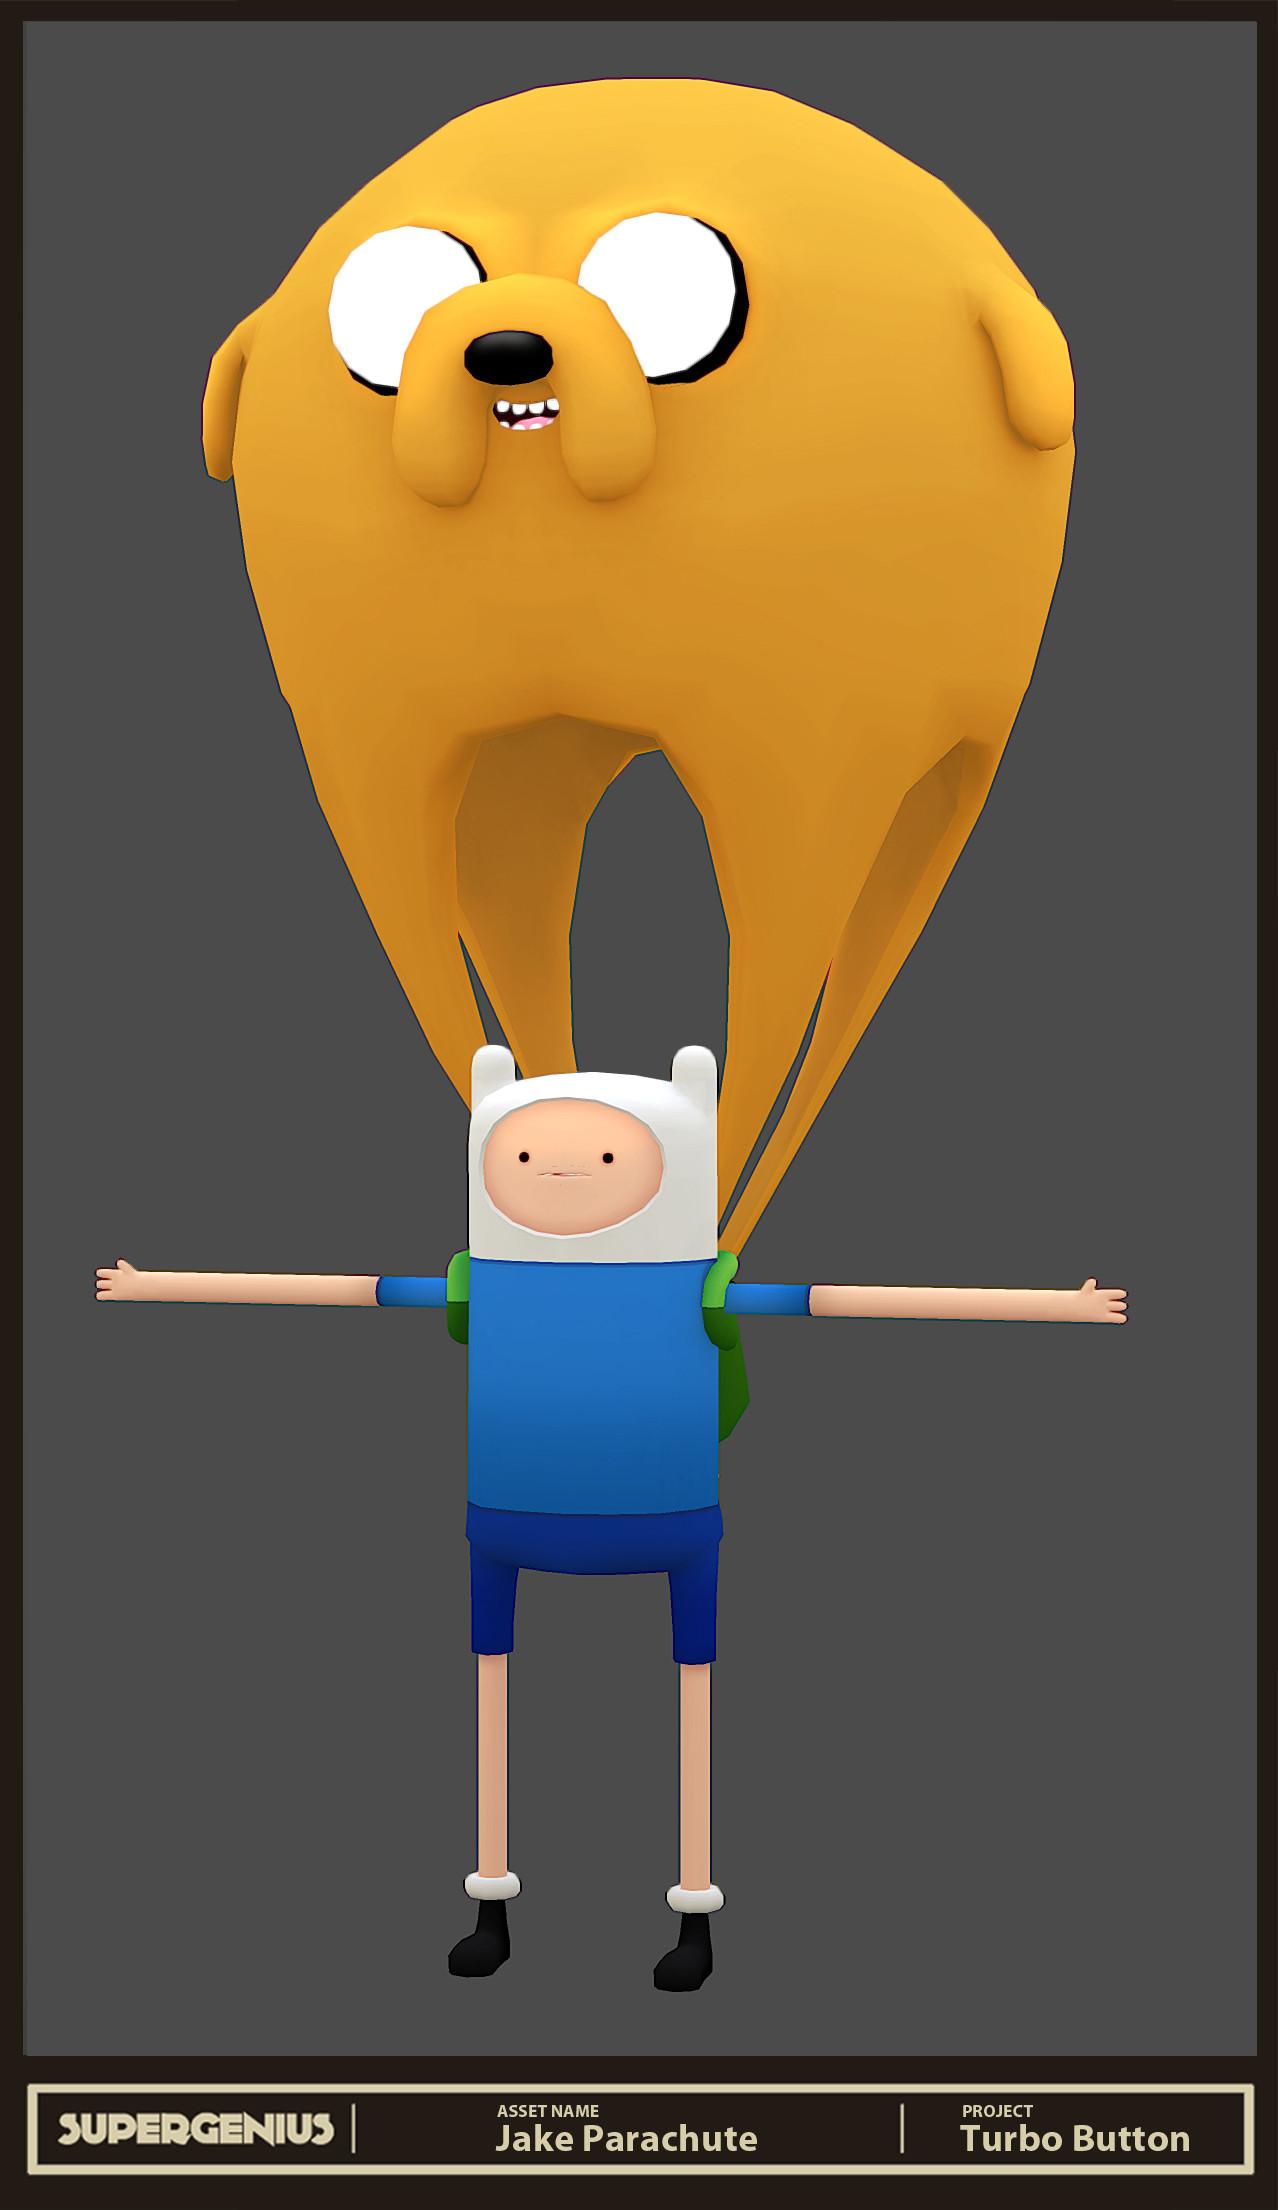 ArtStation - Adventure Time: Magic Man's Head Games (for